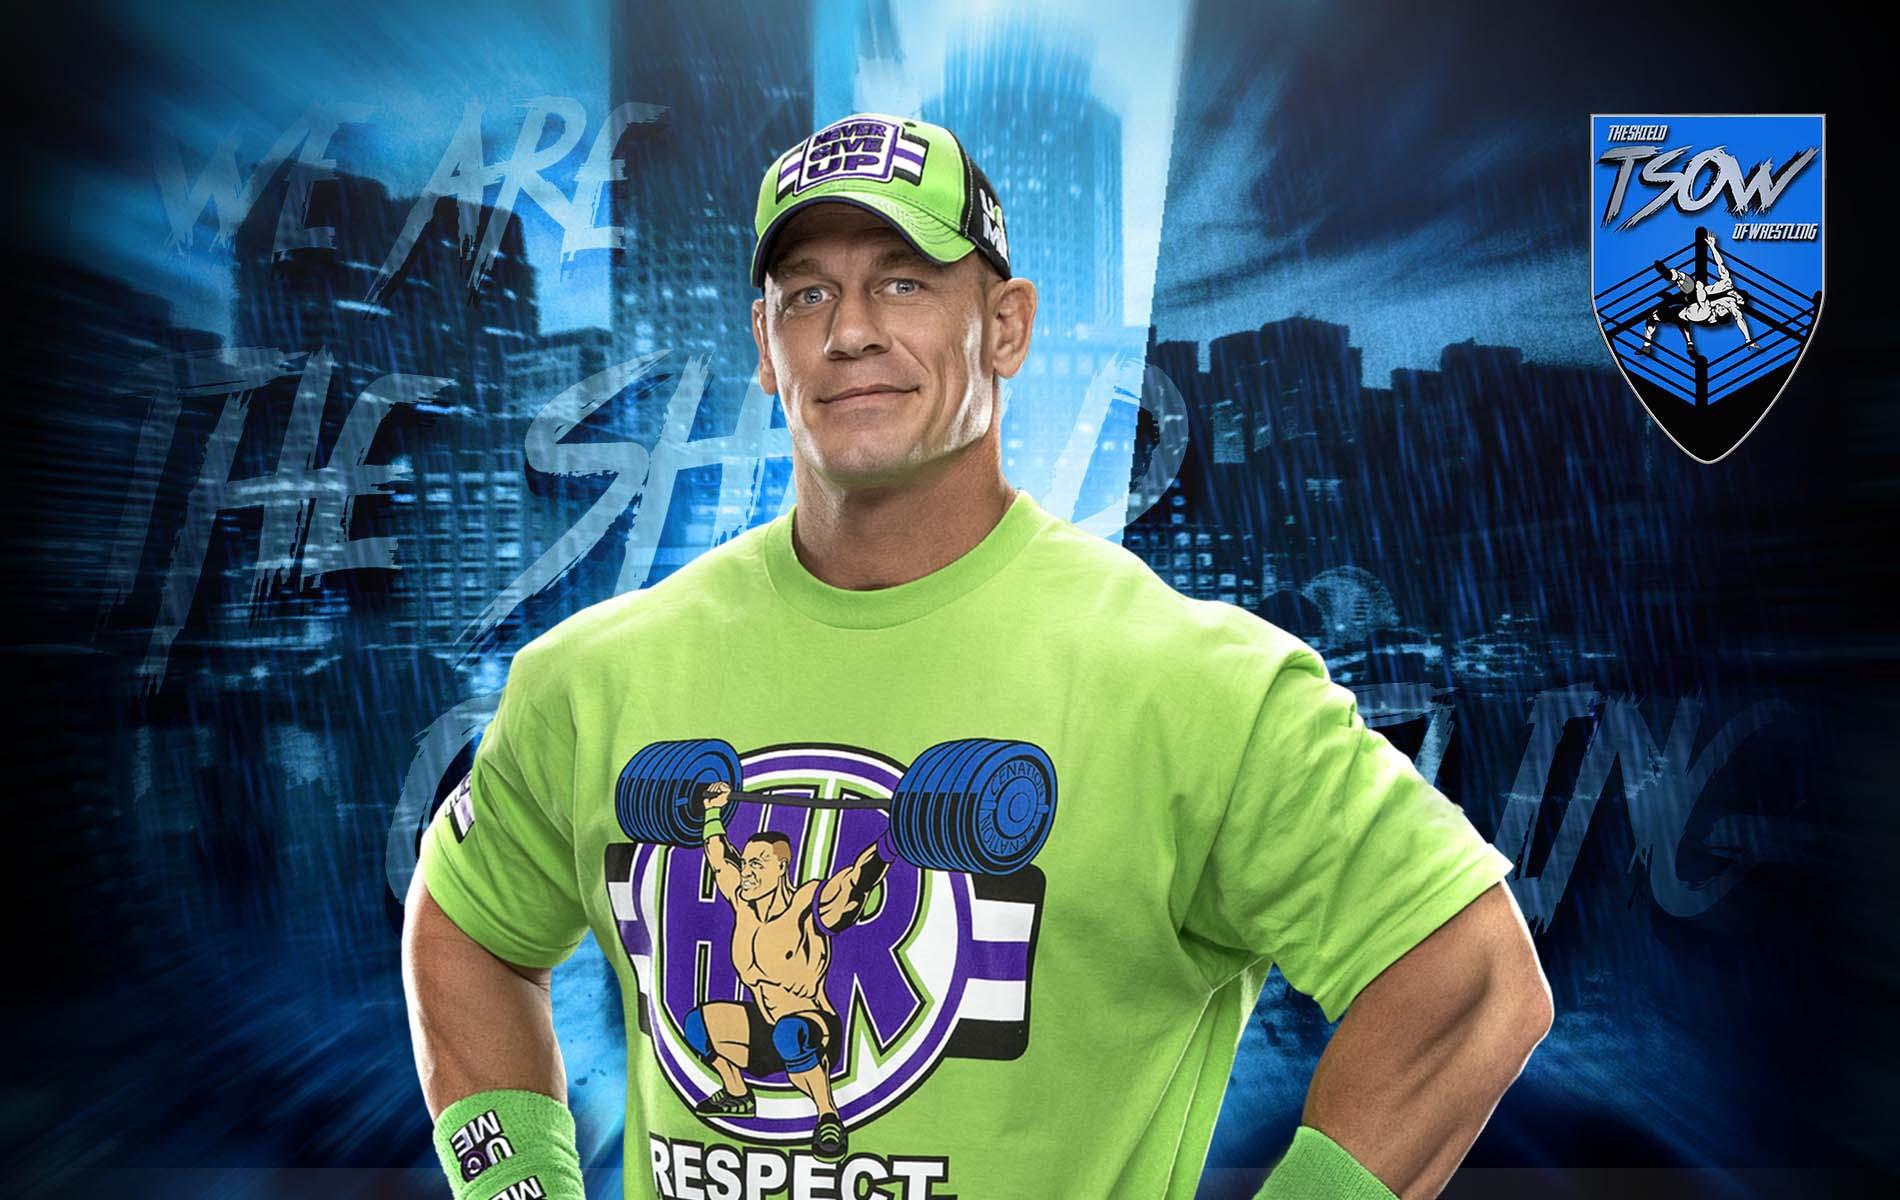 John Cena era pronto per un turn heel